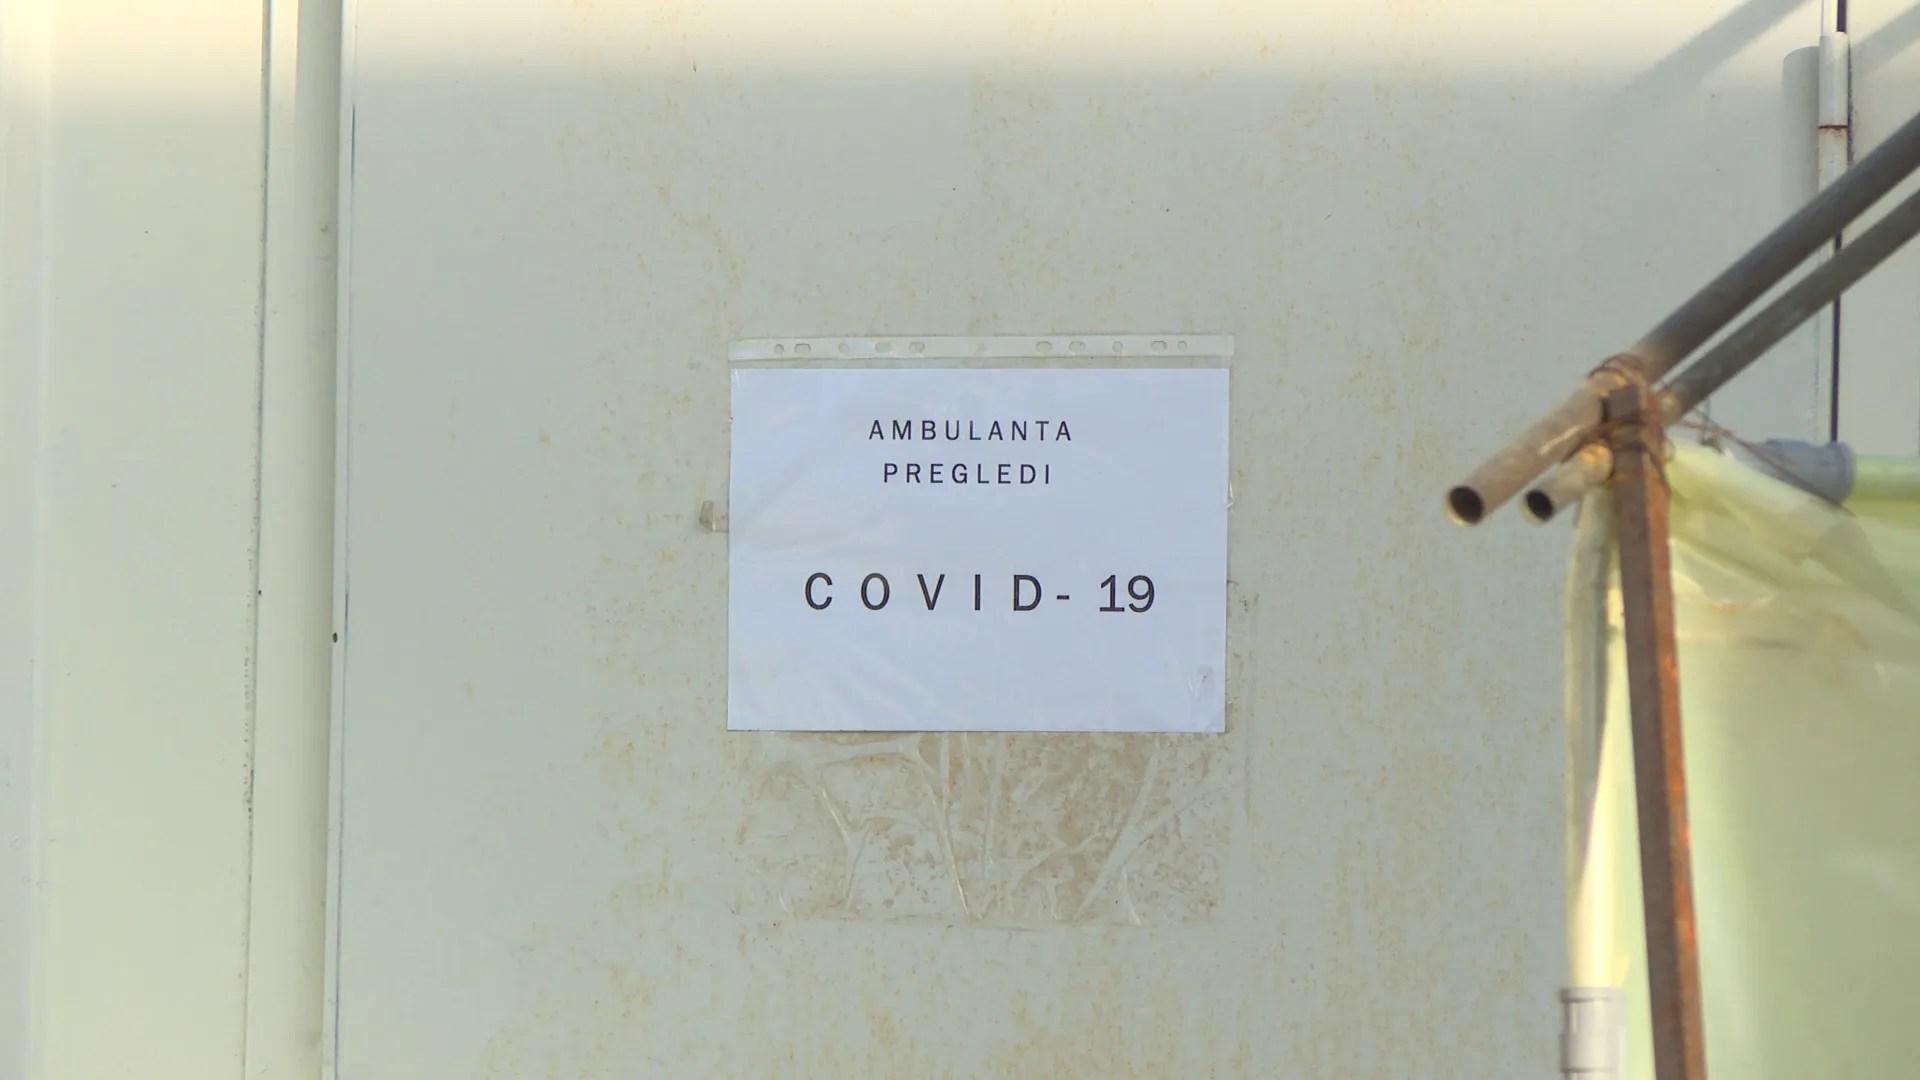 У српским срединама на КиМ преминула два лица, 36 новооболелих